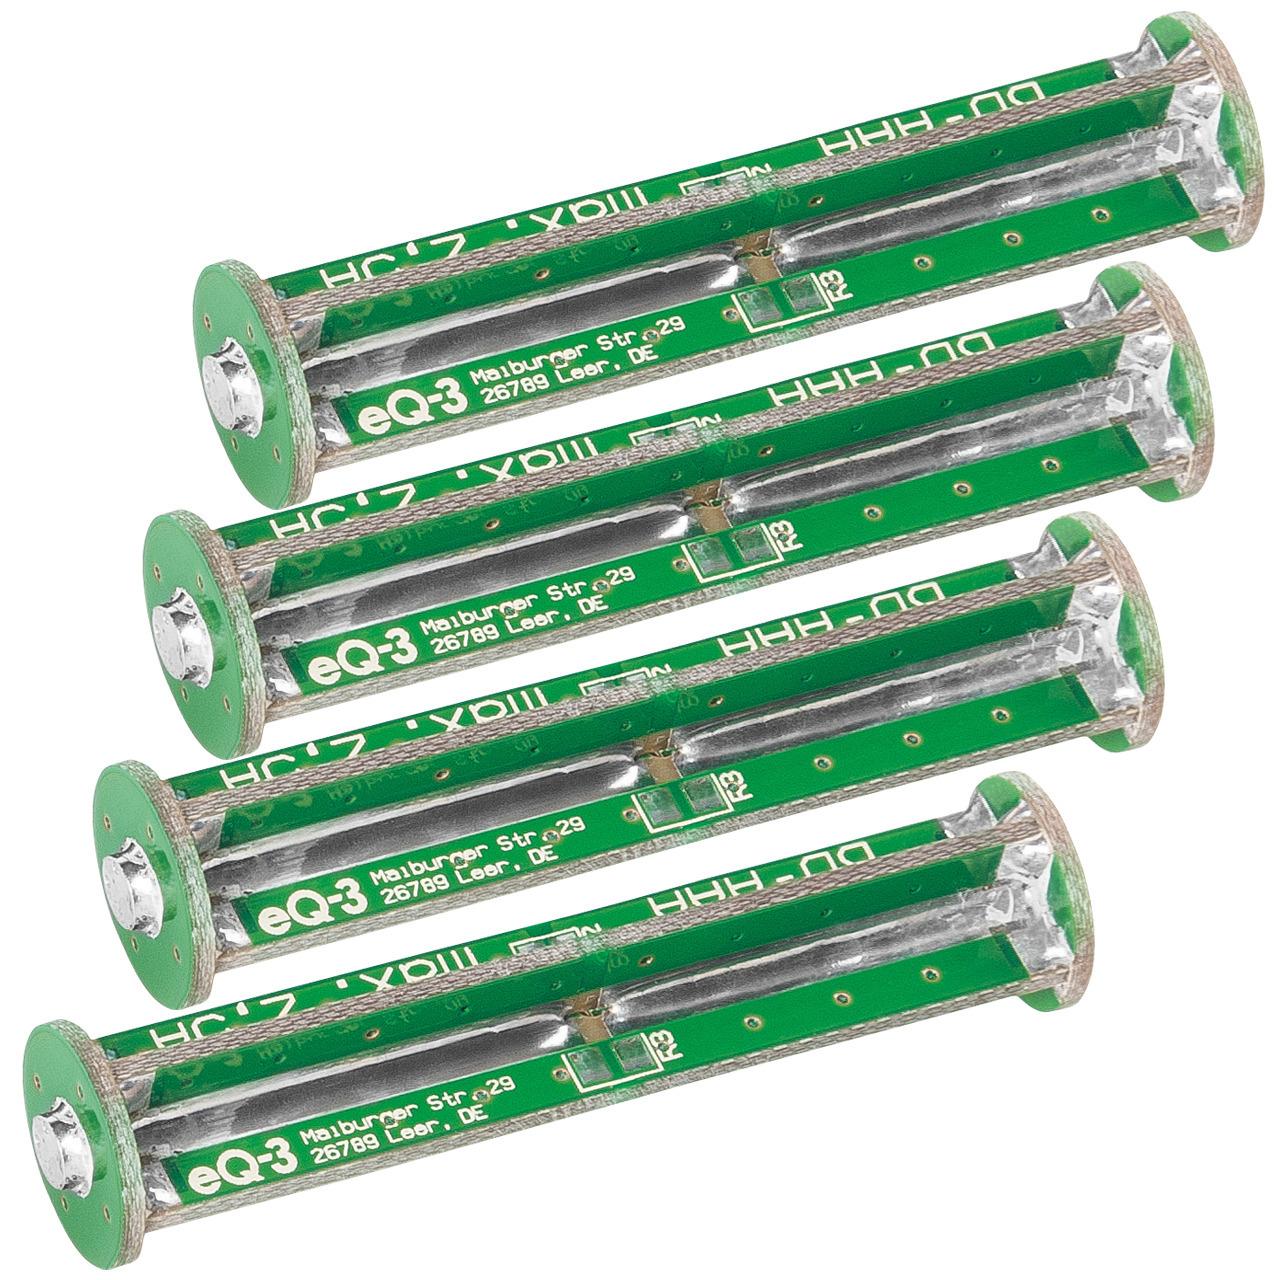 ELV Komplettbausatz Batterie-Dummy-Set BD-AAA- 4x Micro